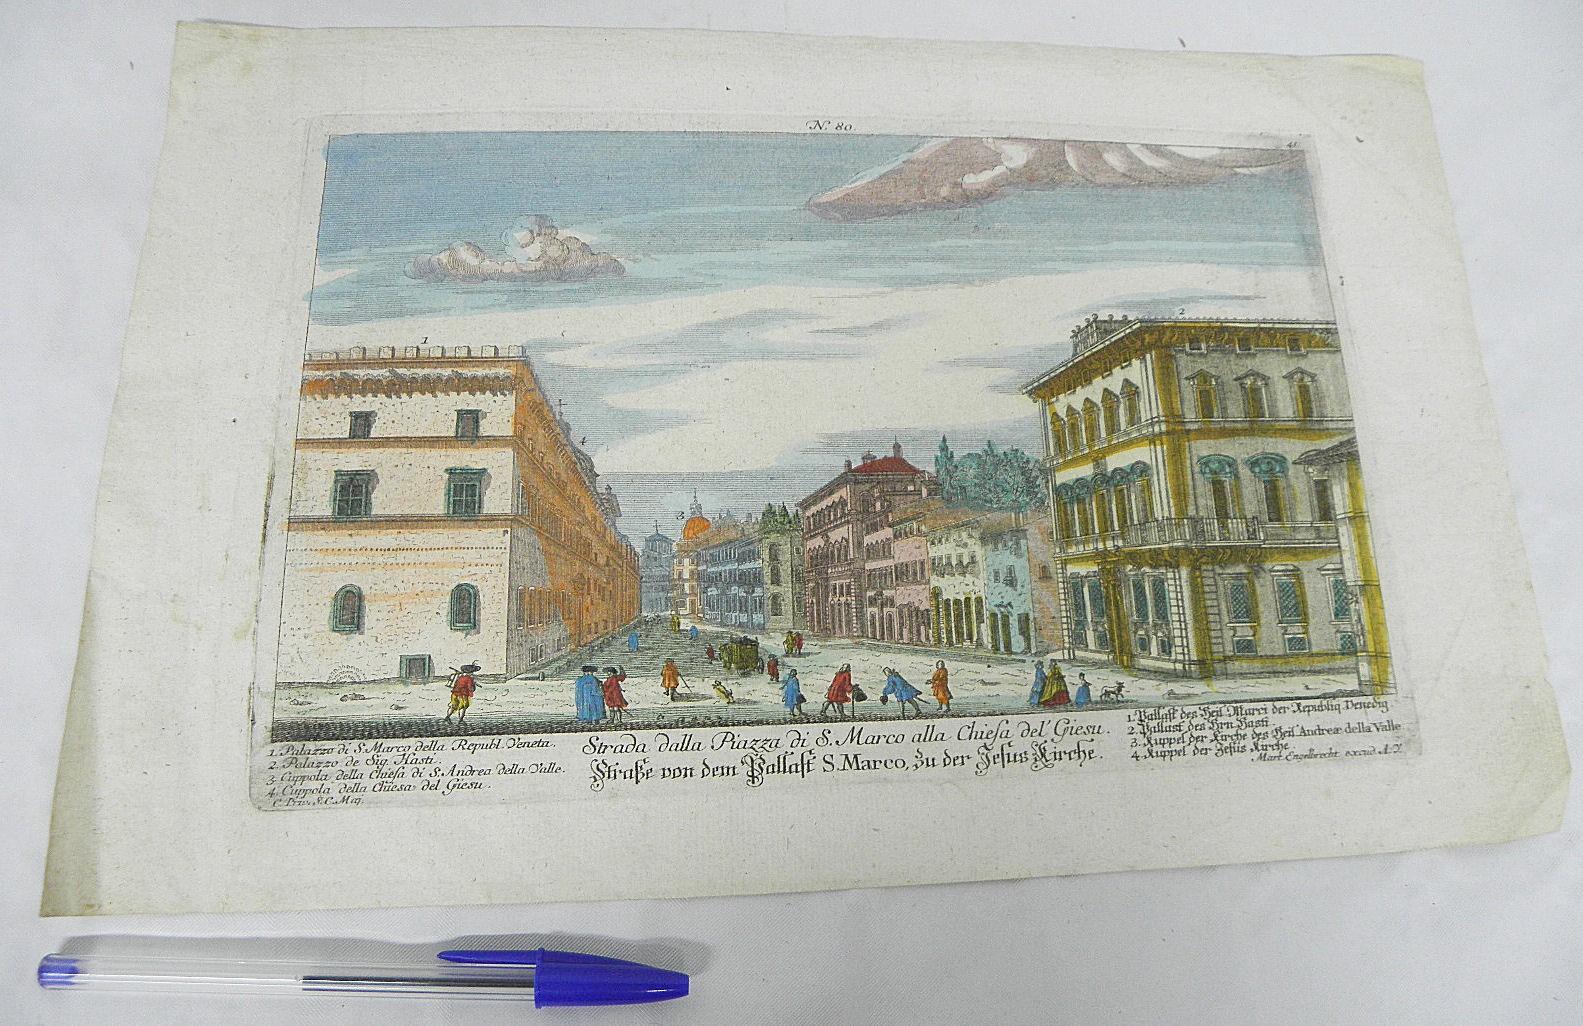 LCOL-VENECIA-PLAZASANMARCO